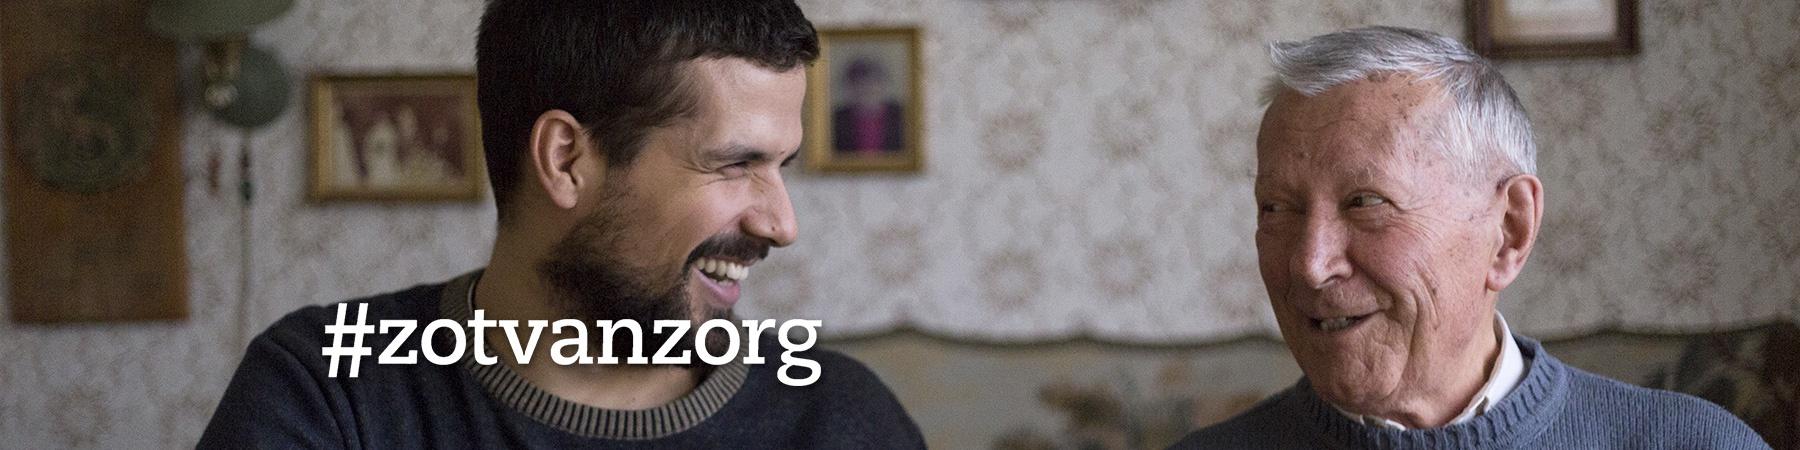 zotvanzorg_website_4_4.jpg